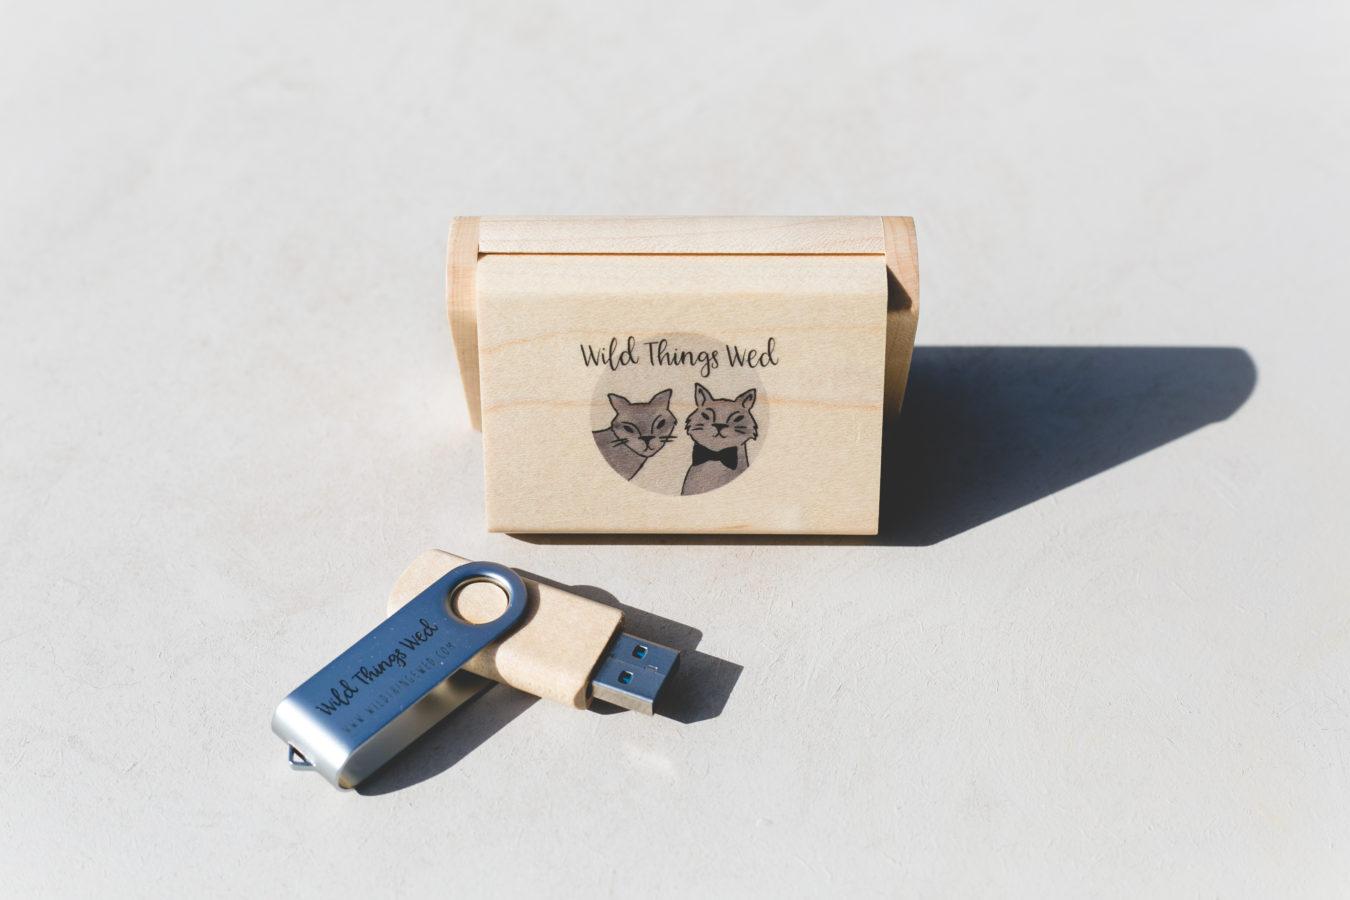 USBs and Branding-4